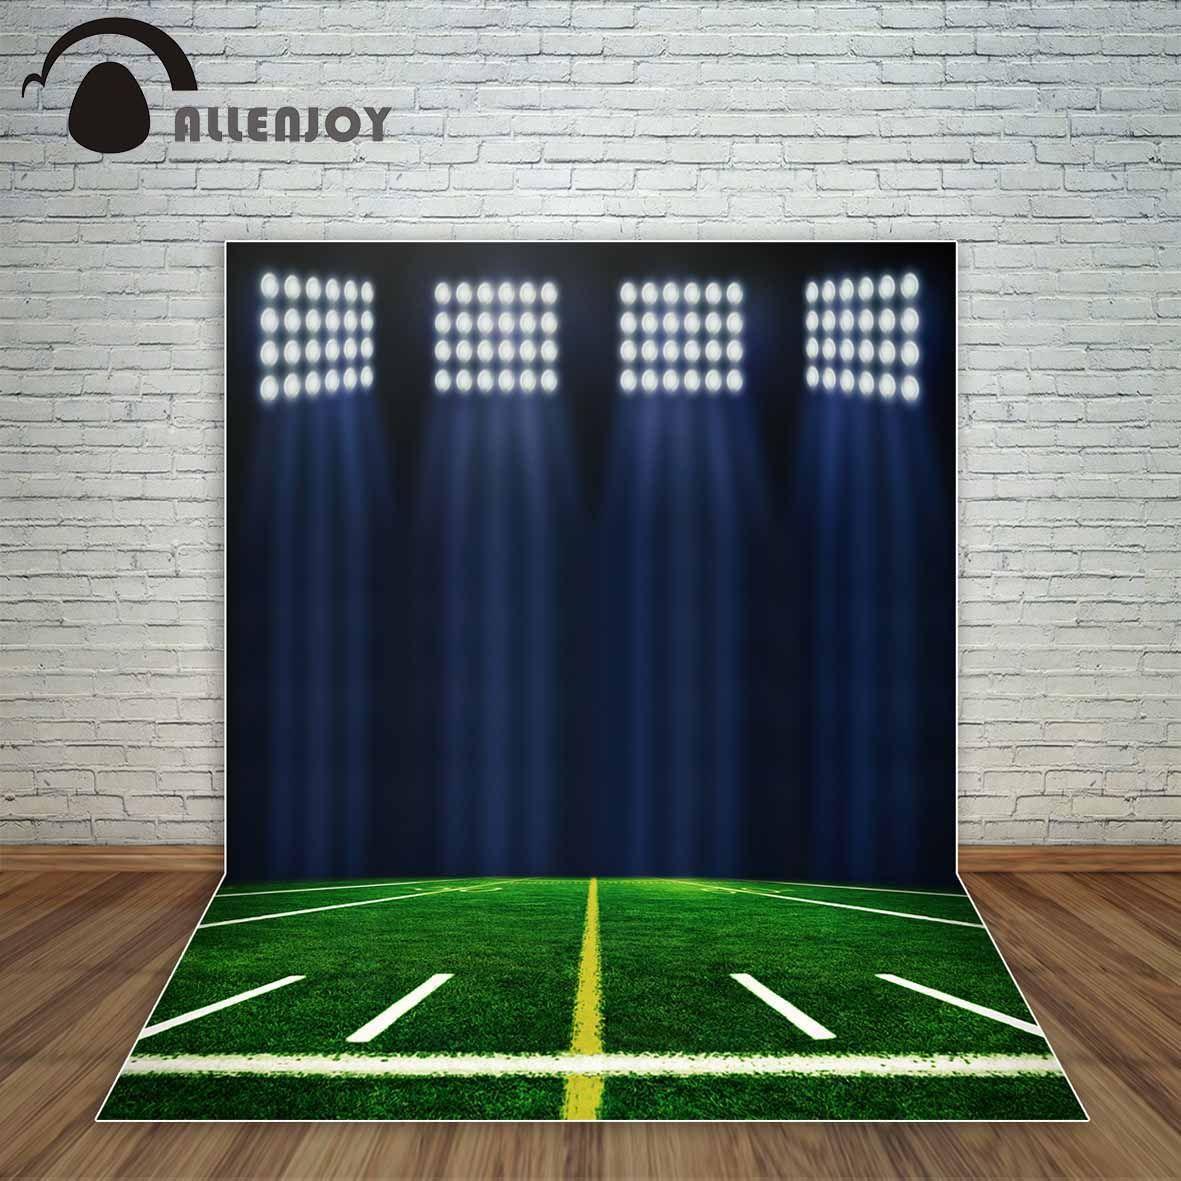 allenjoy american football field